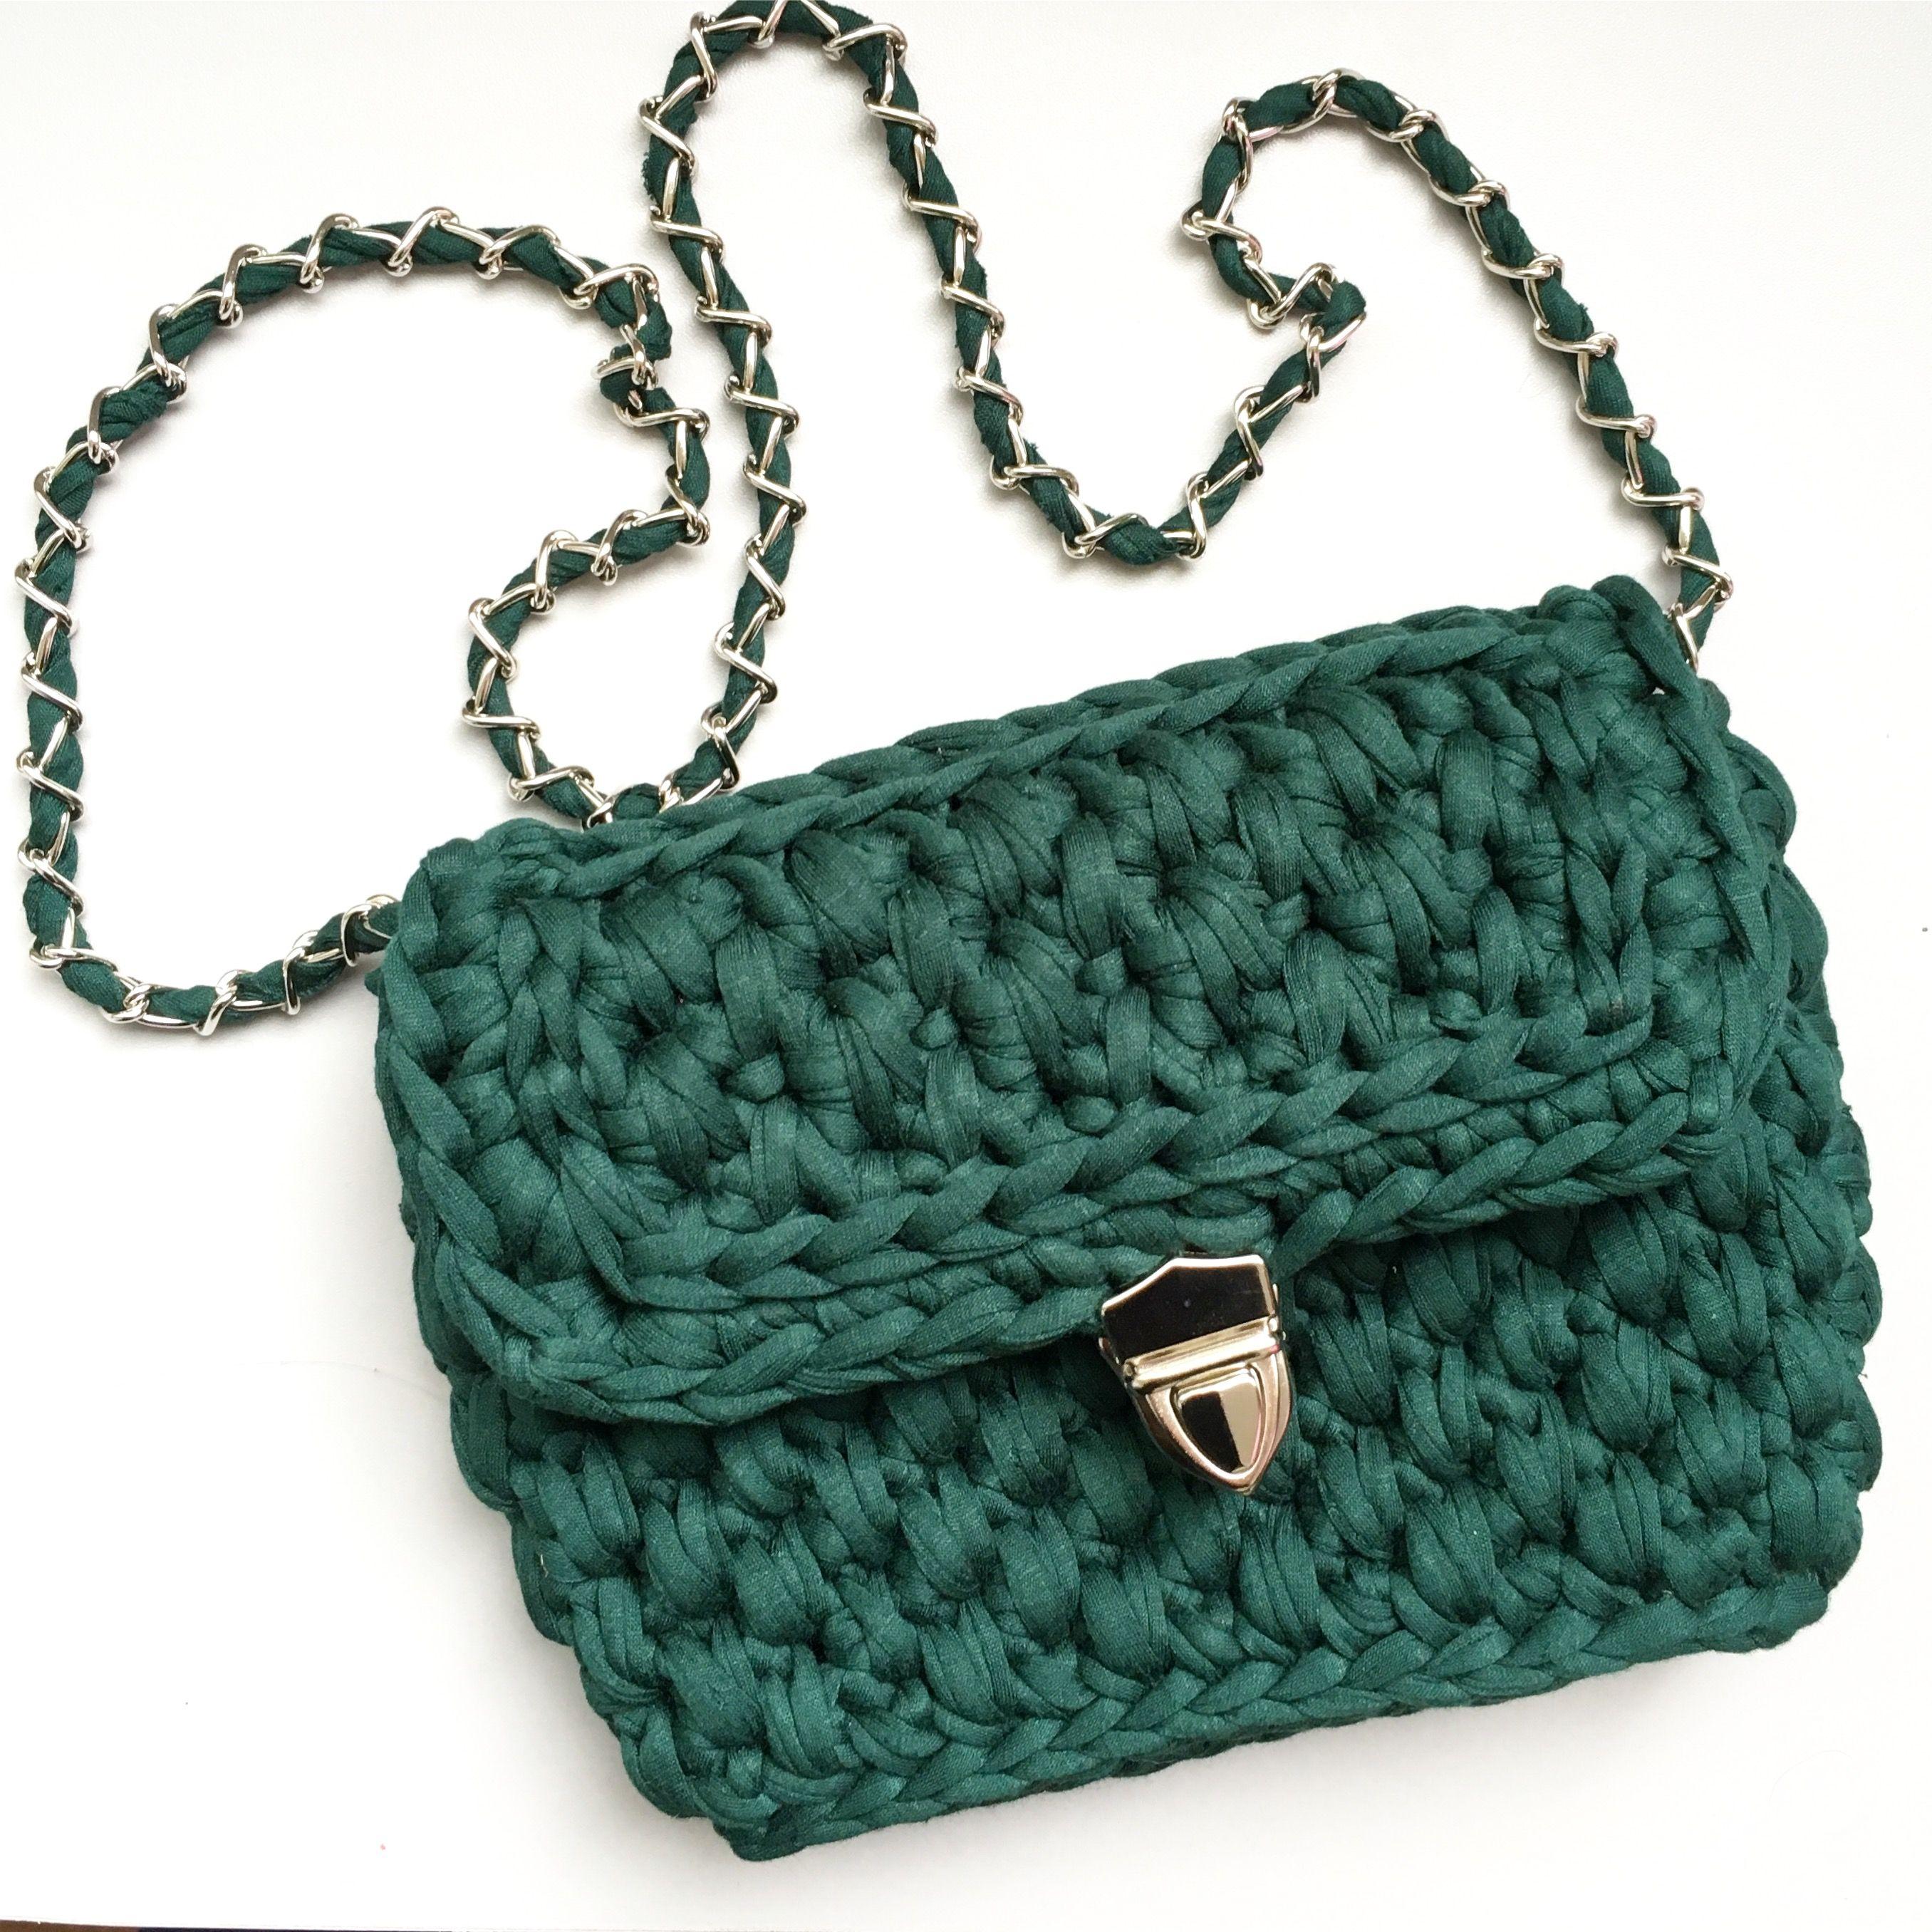 922874a60e94 Изумрудная вязаная сумка из трикотажной пряжи ( crochet bag, bolso de  trapillo, t-shirt yarn)